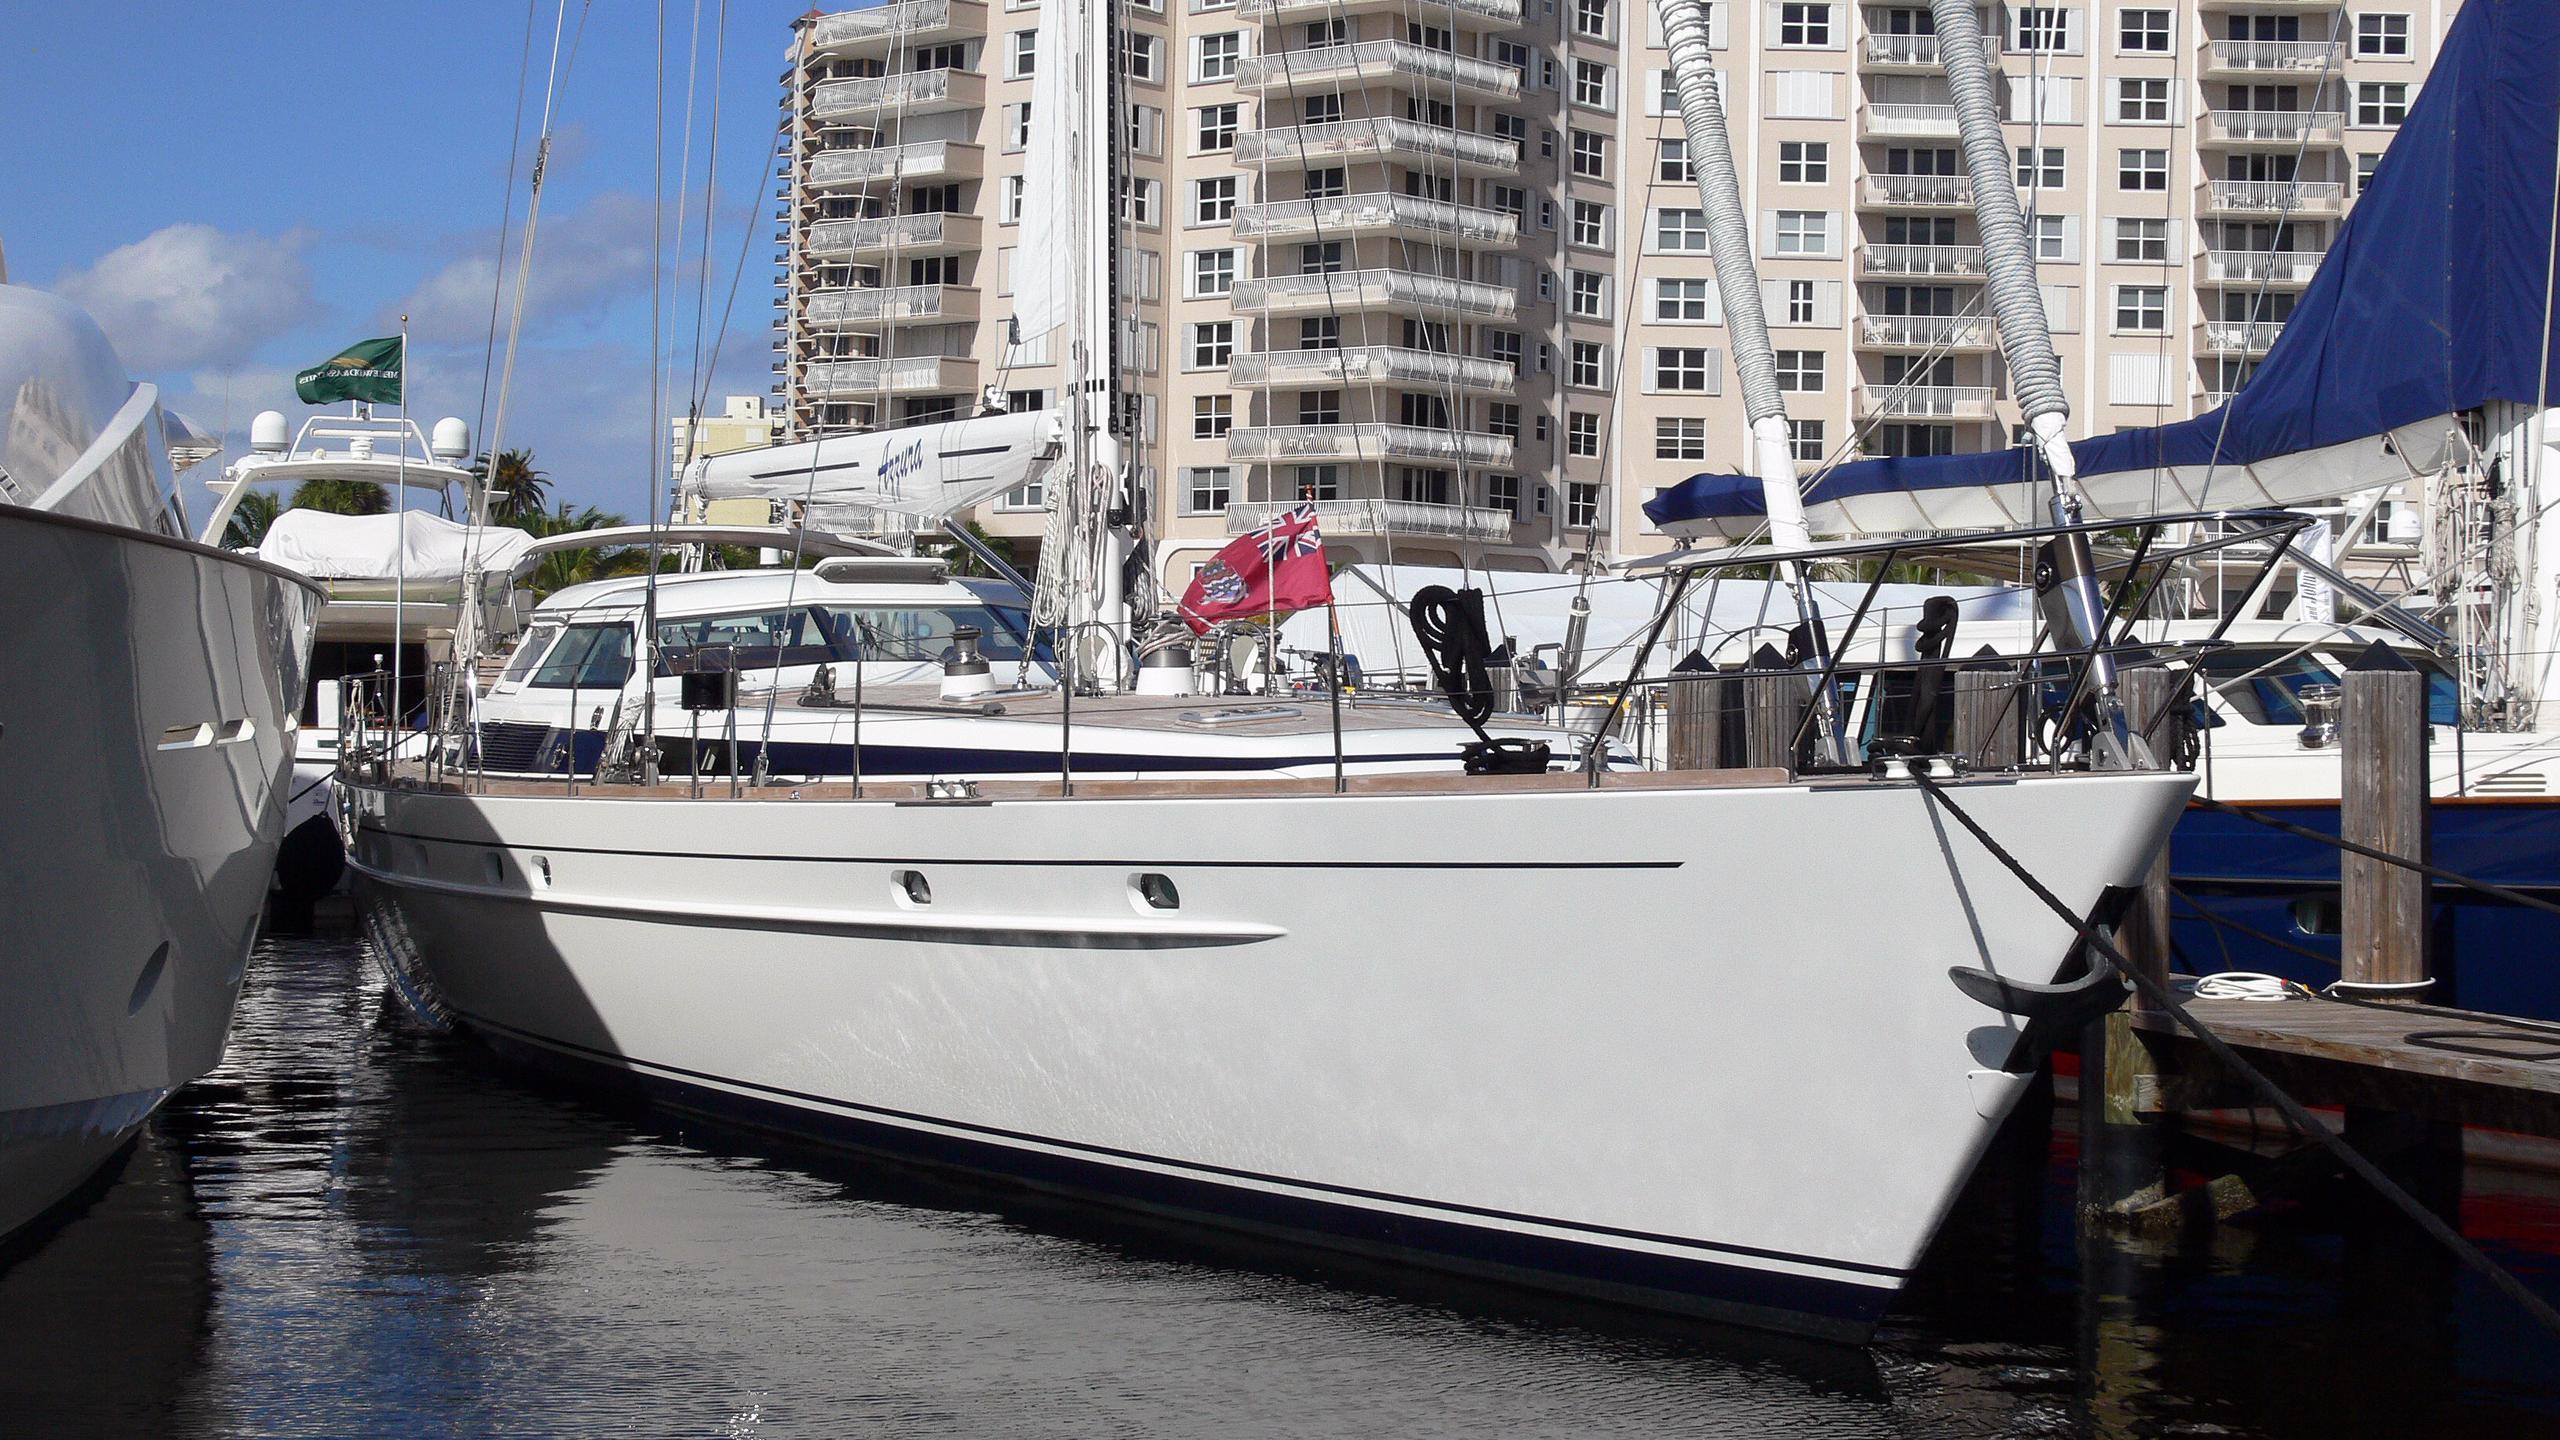 lady-vail-azzura-sailing-yacht-jongert-3000m-1998-29m-bow